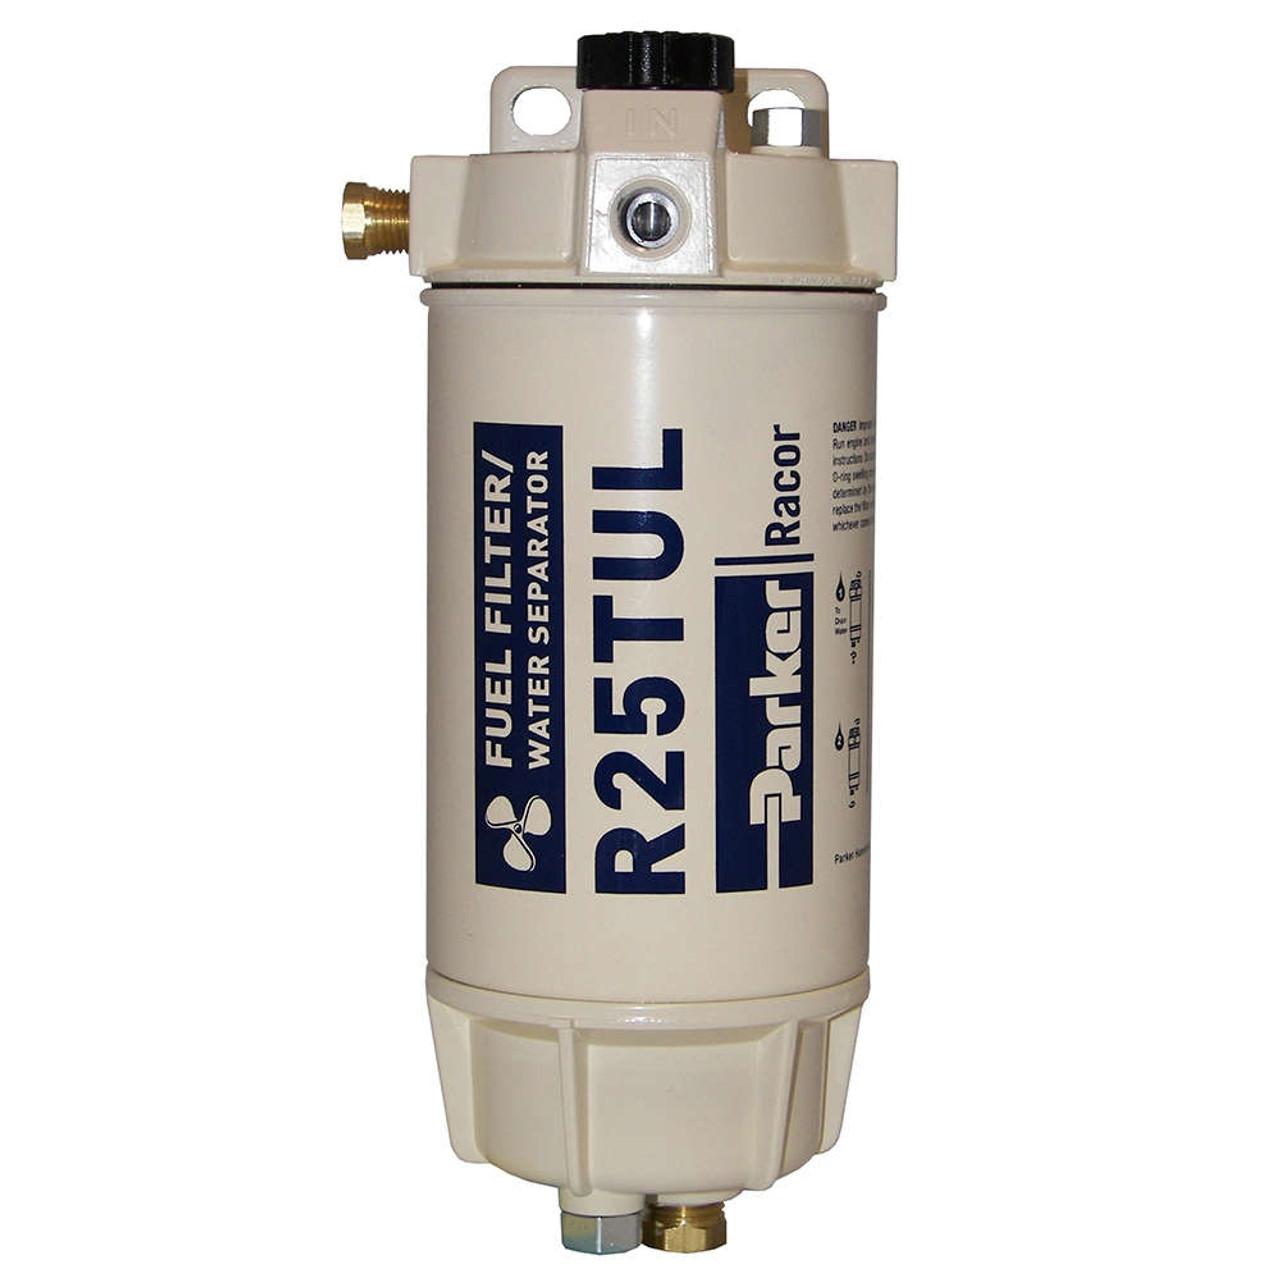 Racor 1/4 in. 45 GPH Aquabloc Marine Spin-On Type Diesel Fuel